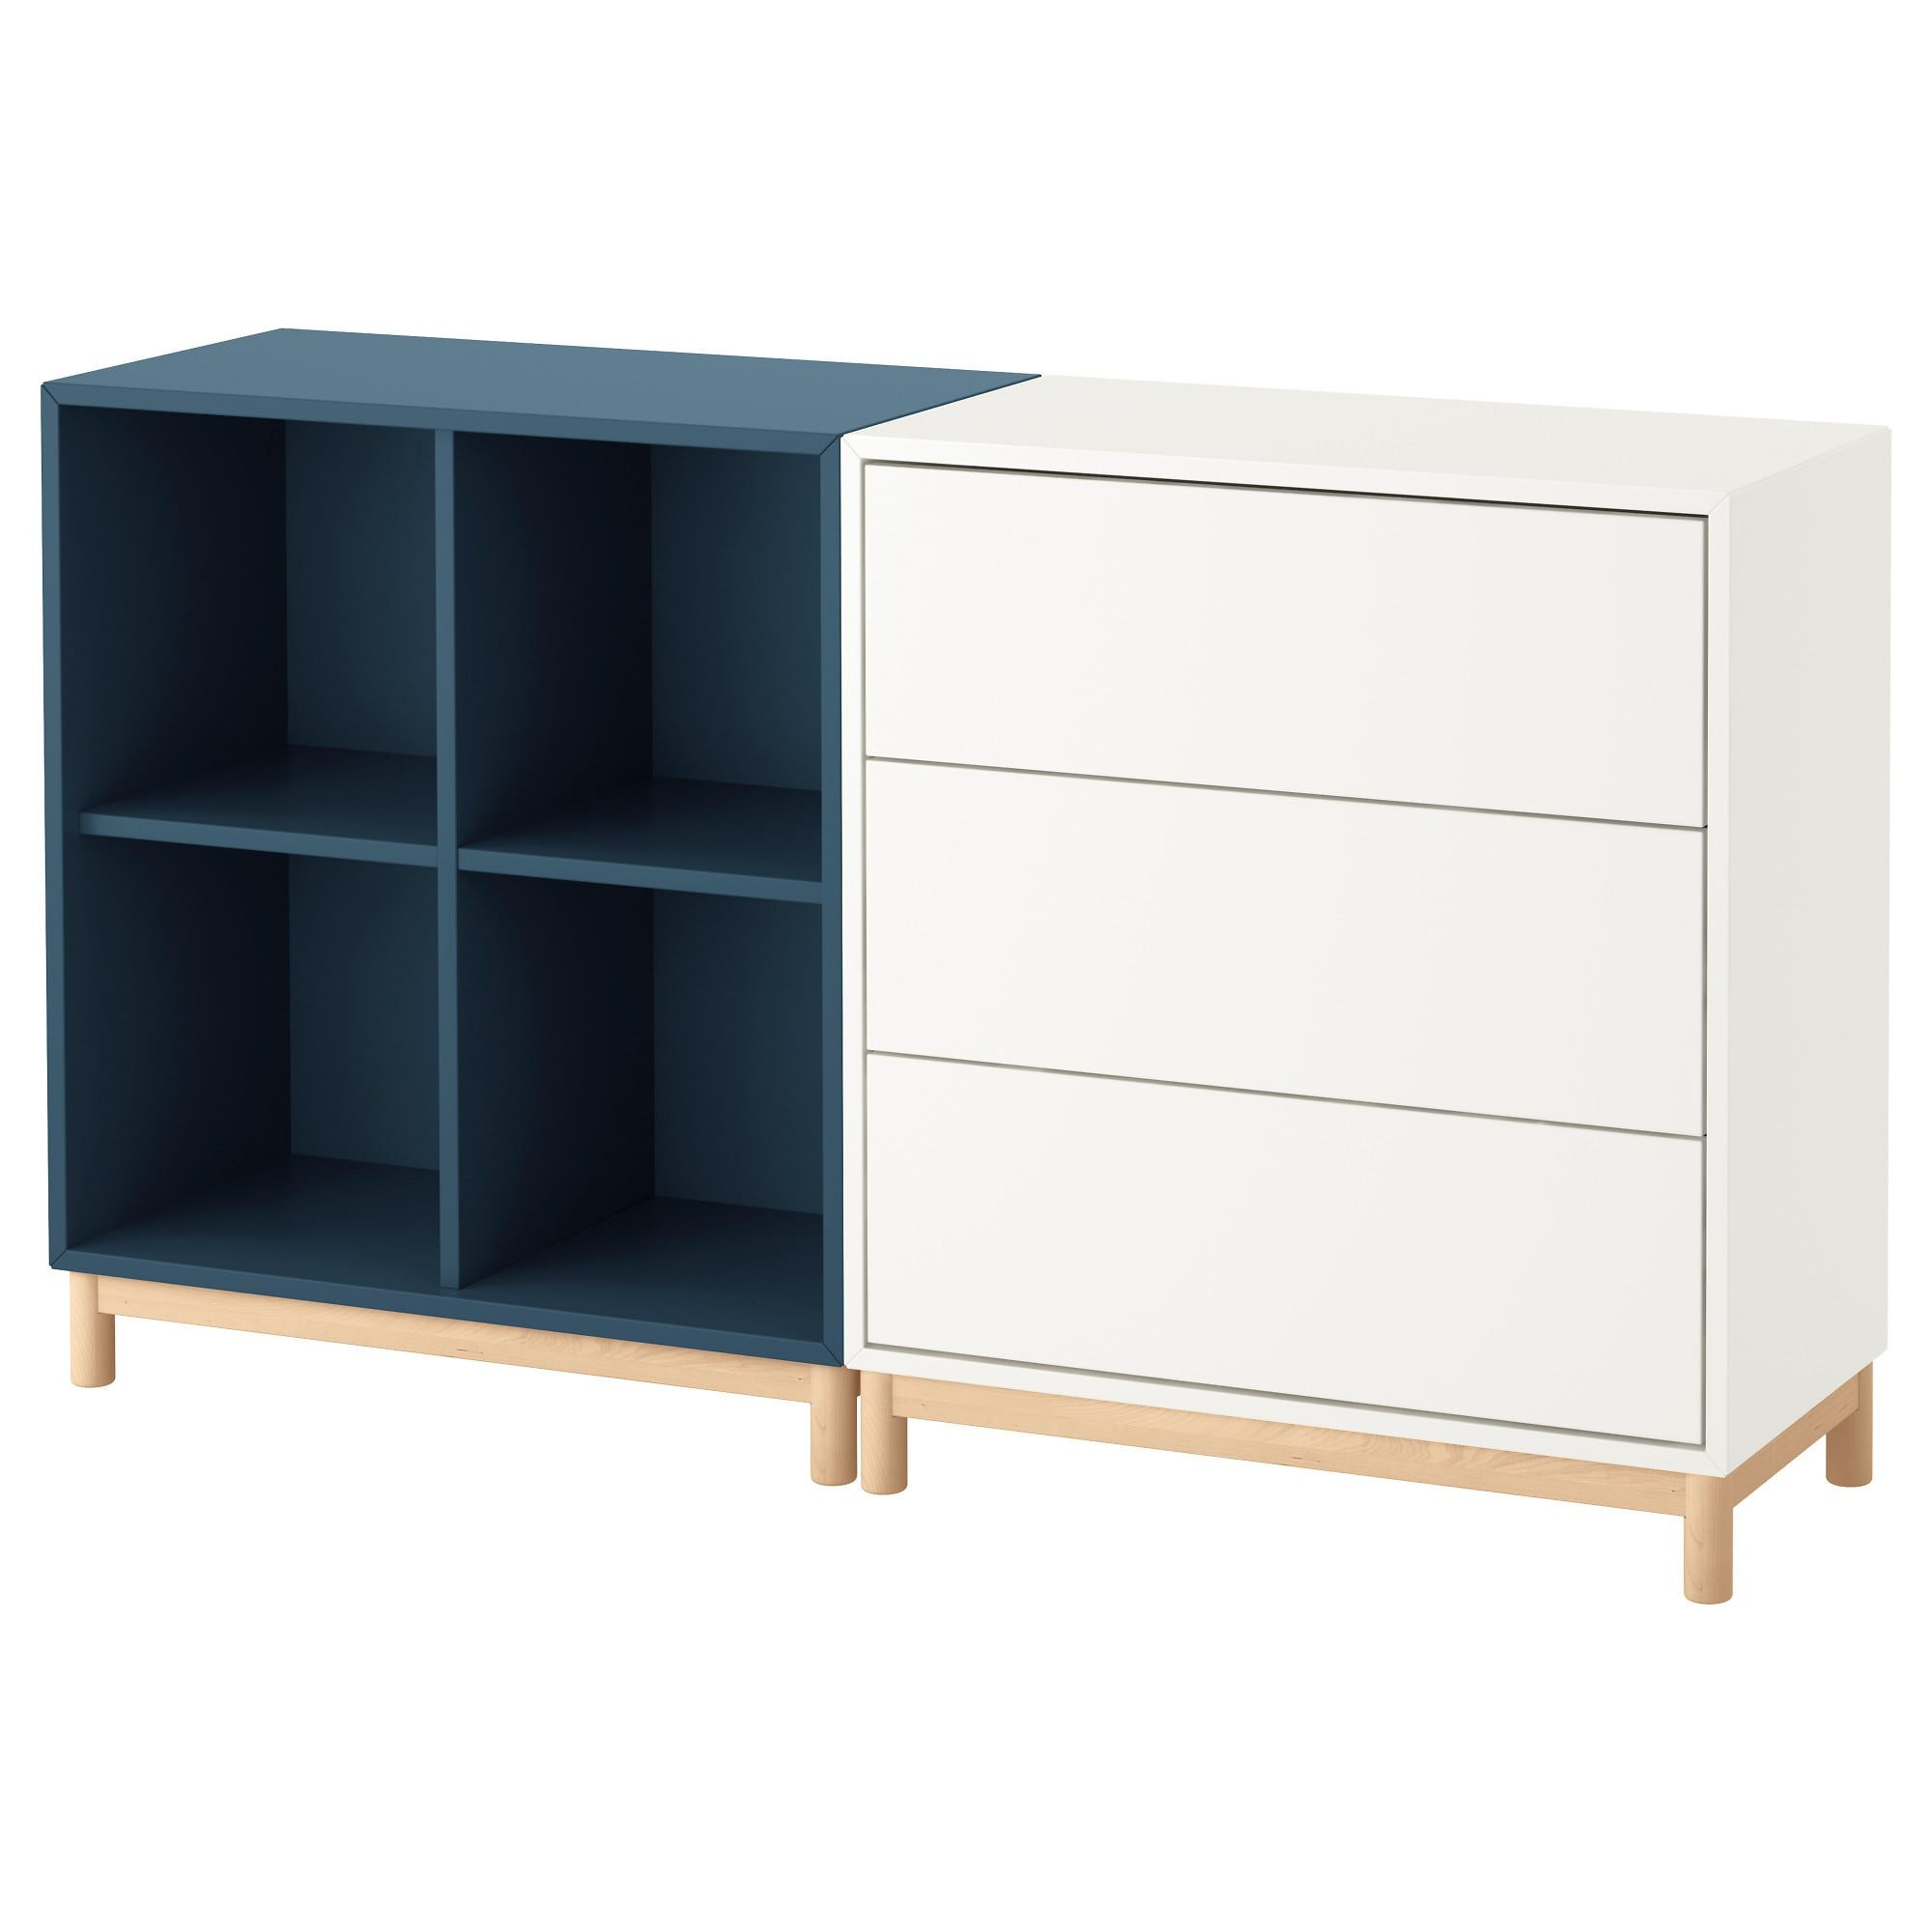 Ikea Lit 160 Belle Eket Collection